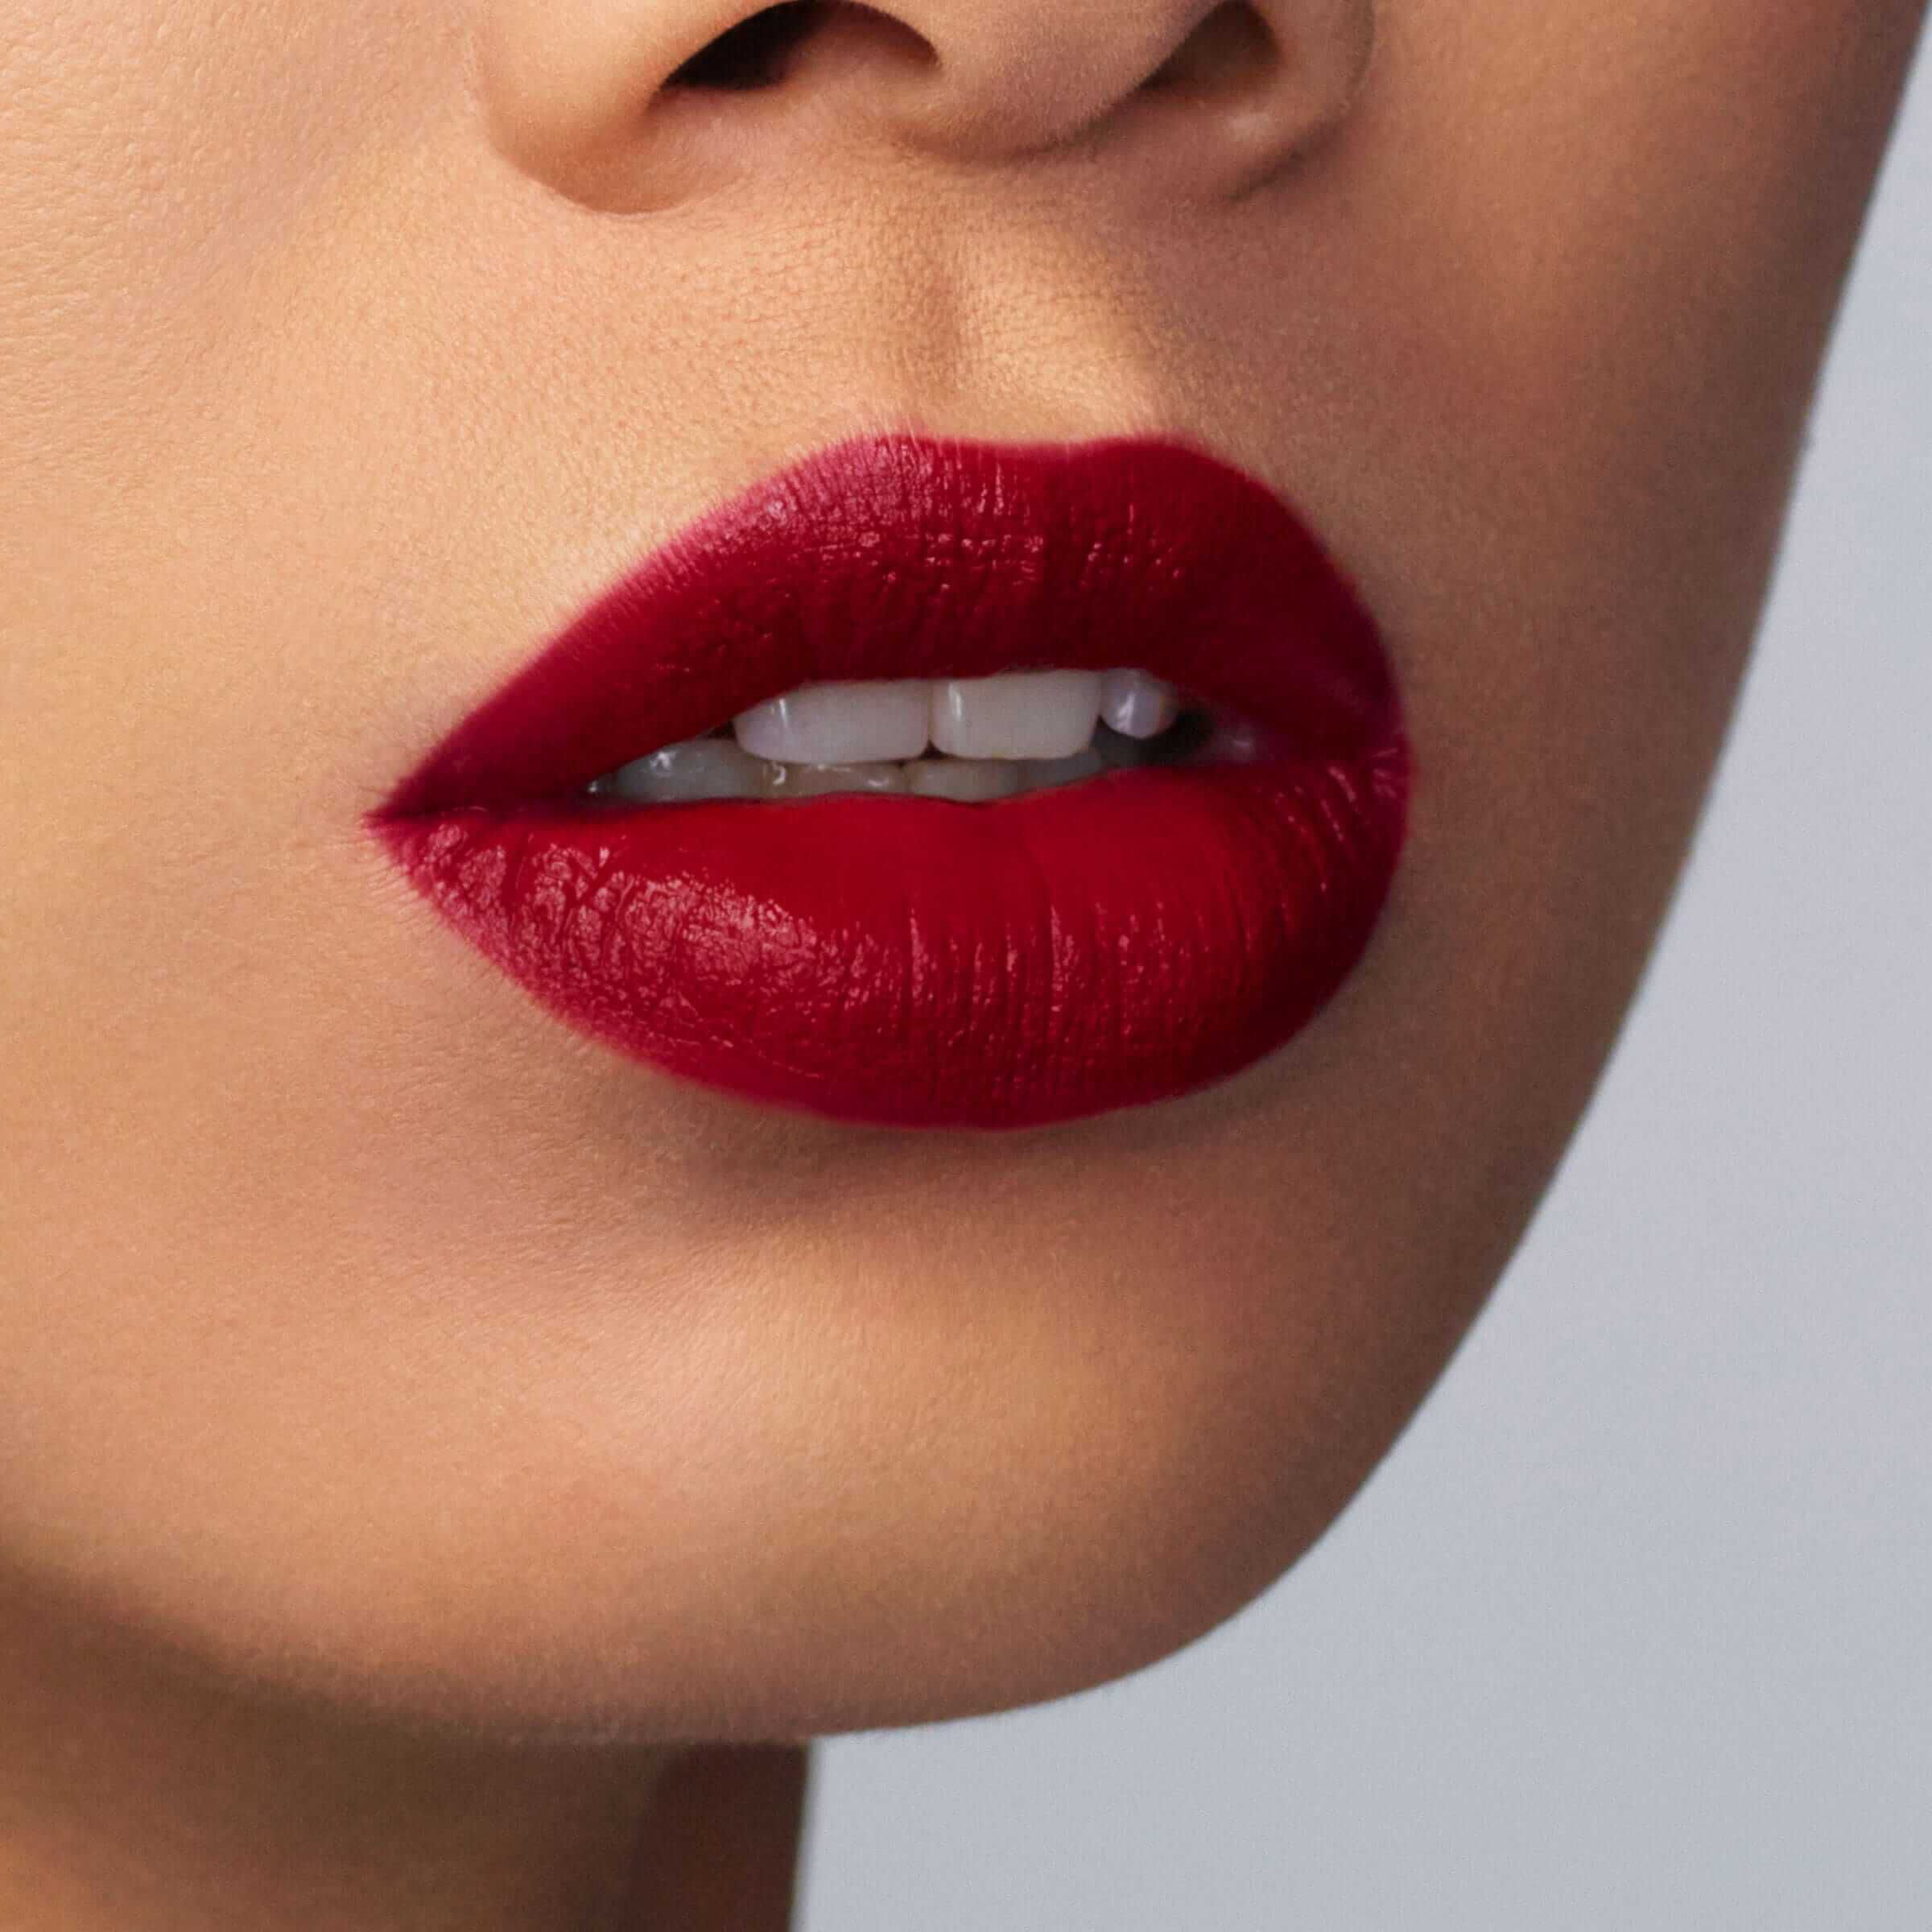 rouge d armani lipstick